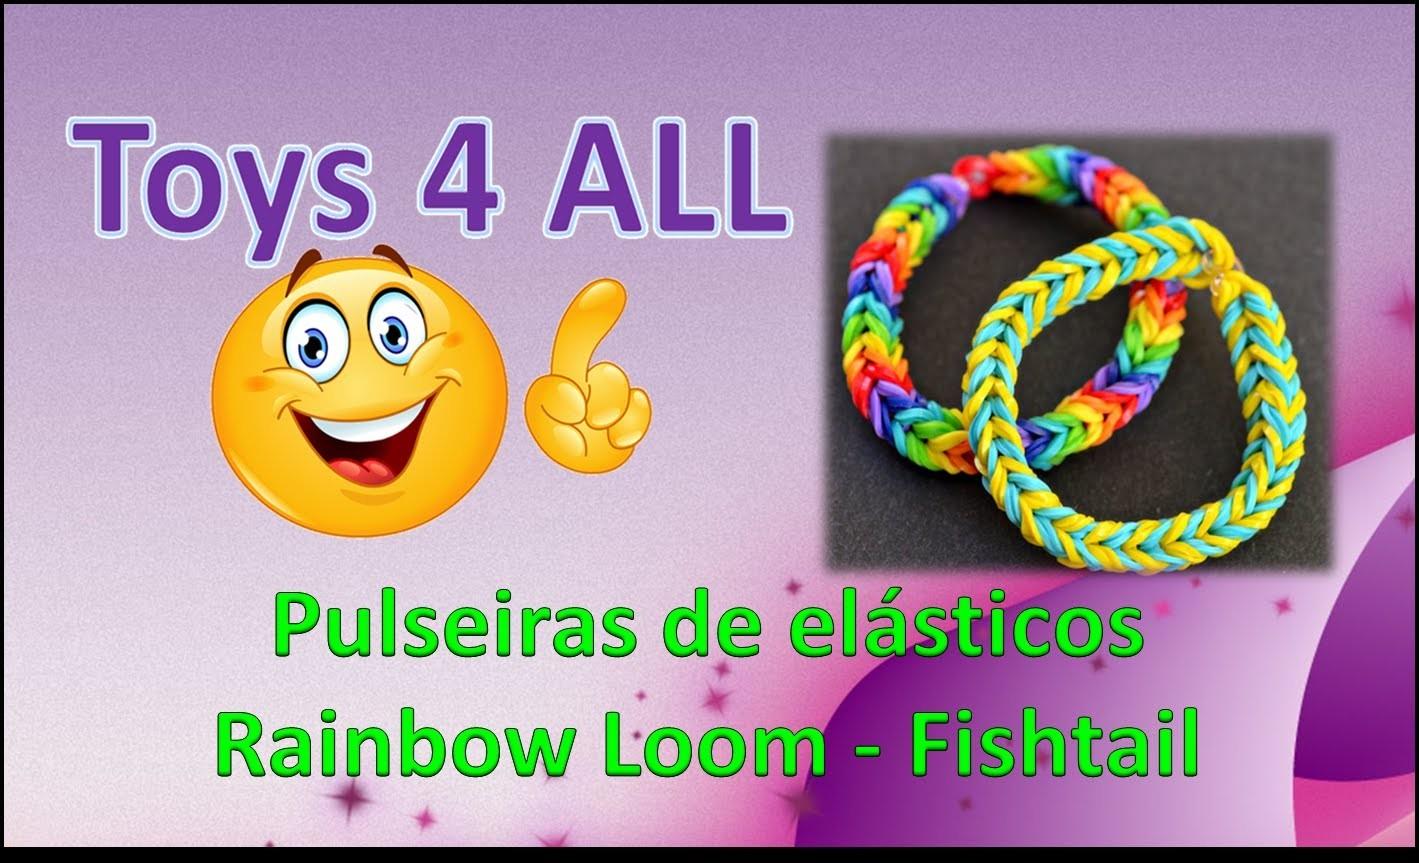 Pulseiras elasticos rainbow loom fishtail exemplos